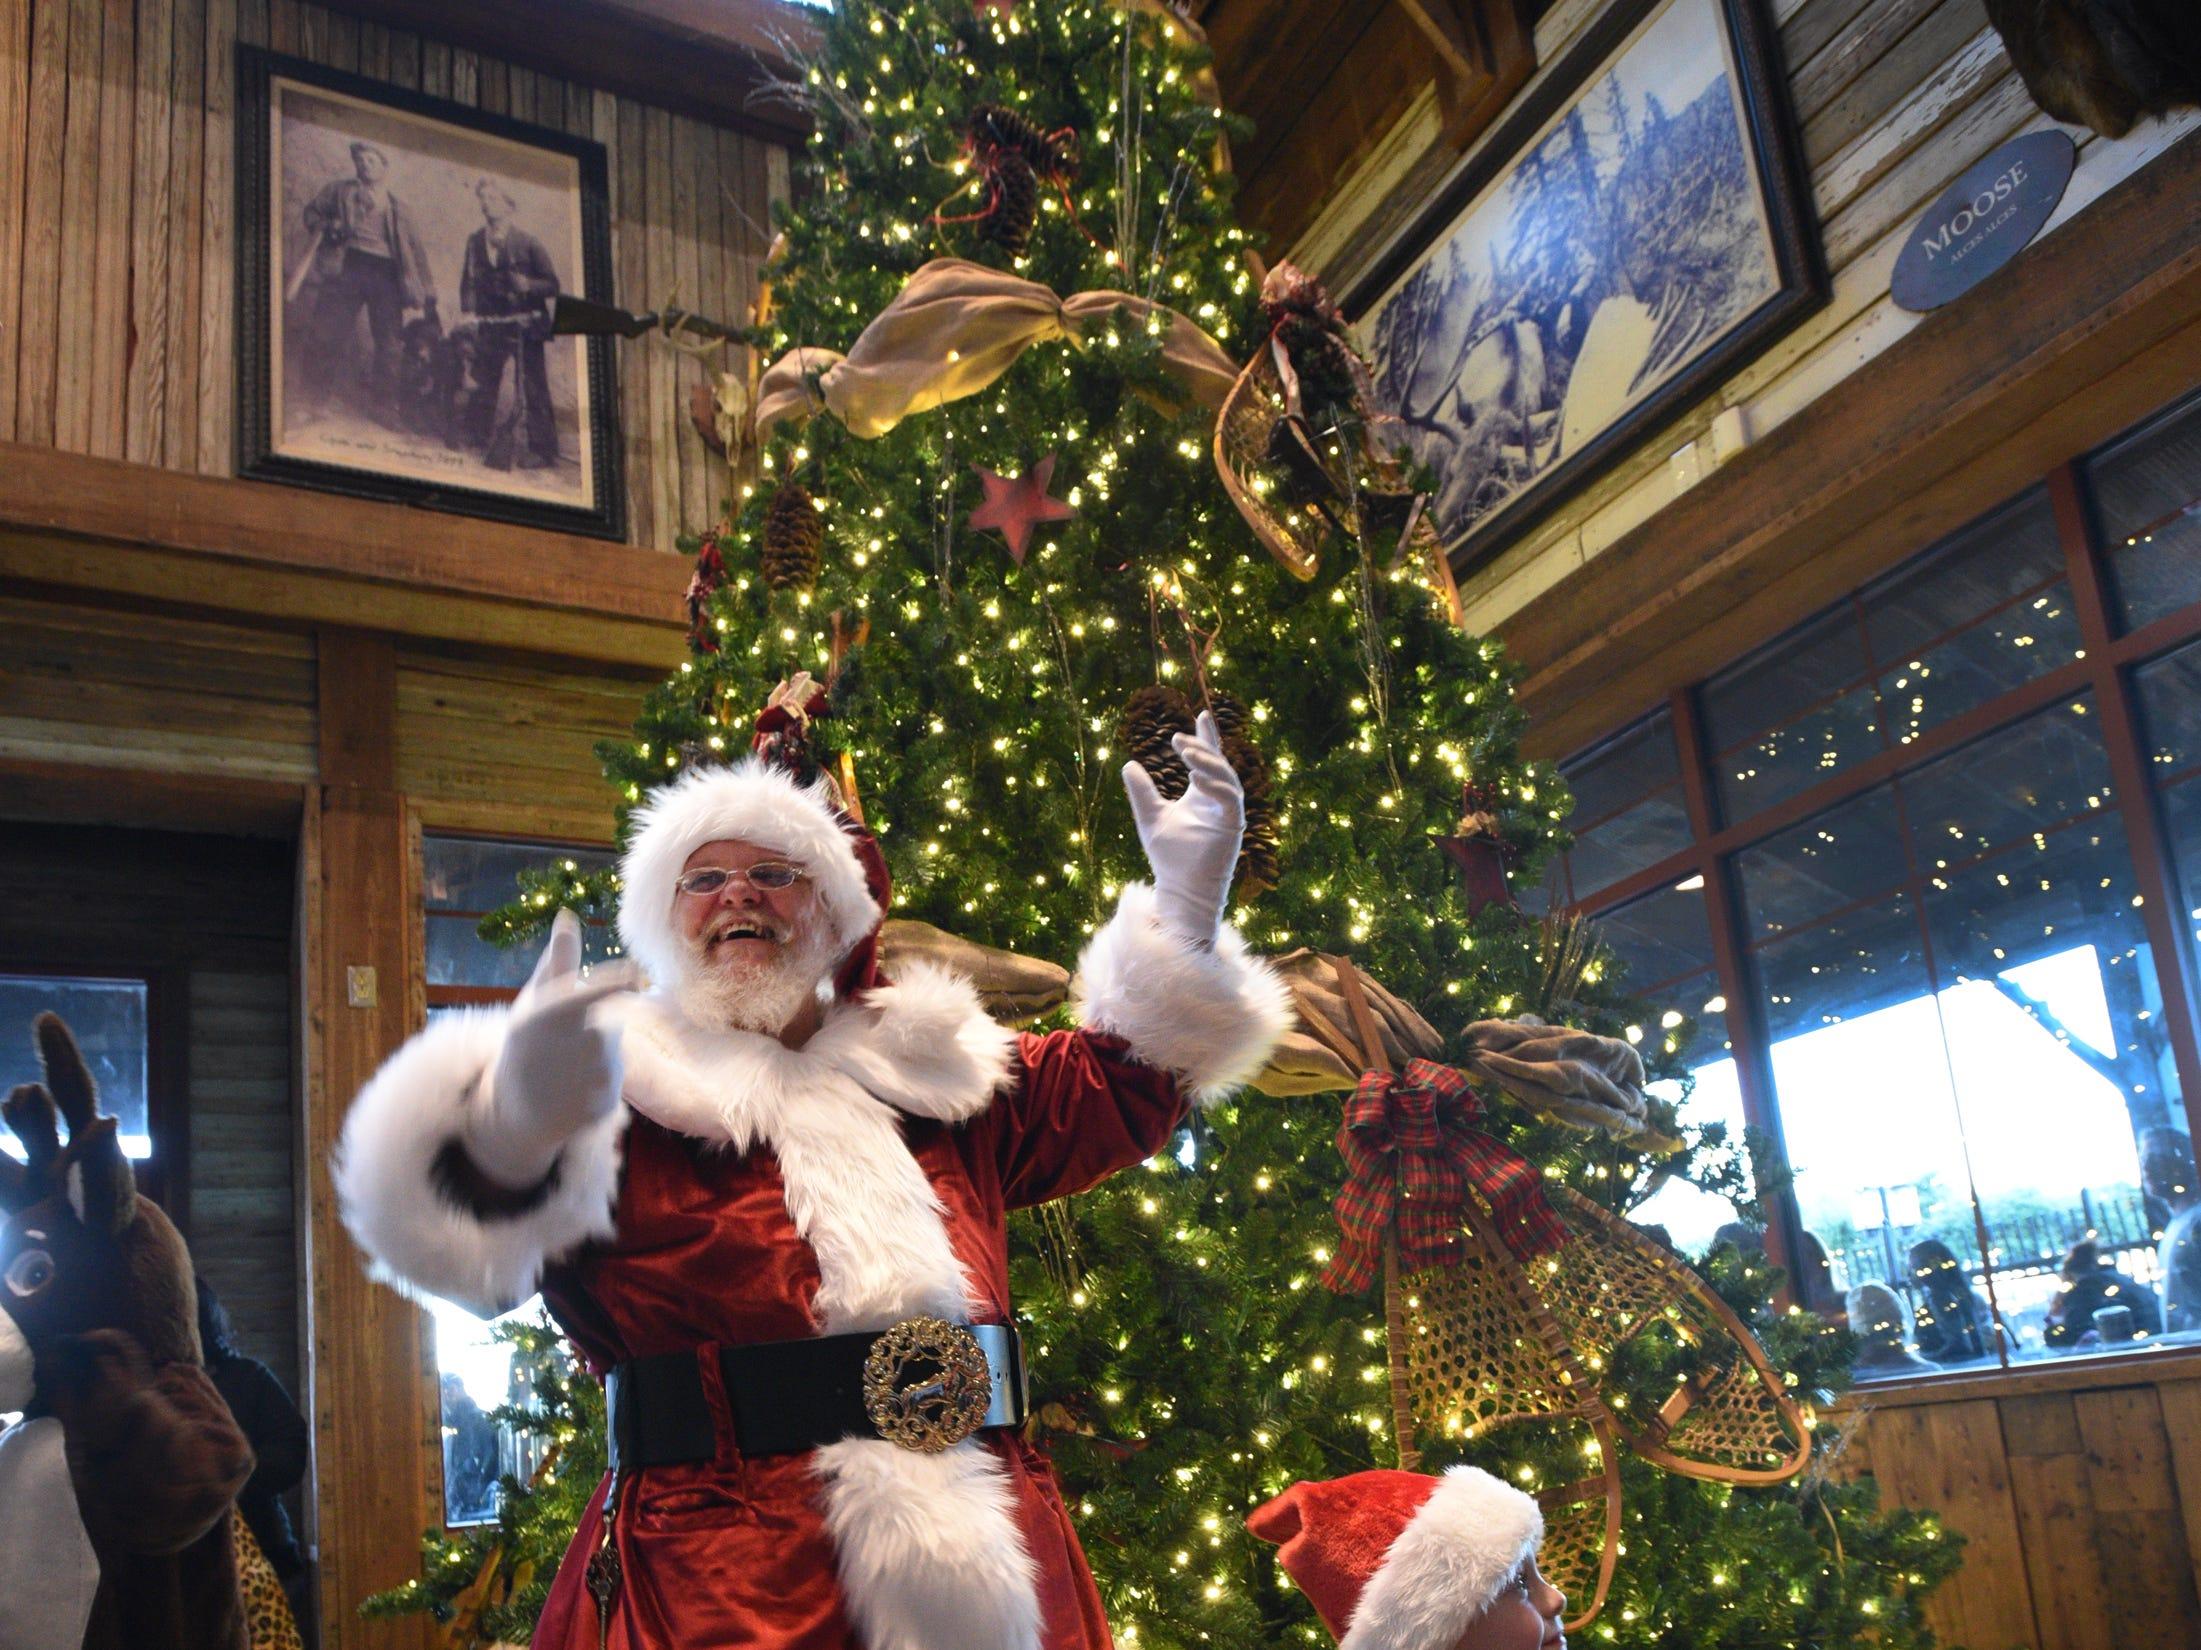 Santa lights the Christmas tree after the Bass Pro Shops-Louisiana Boardwalk Outlets Santa Parade.